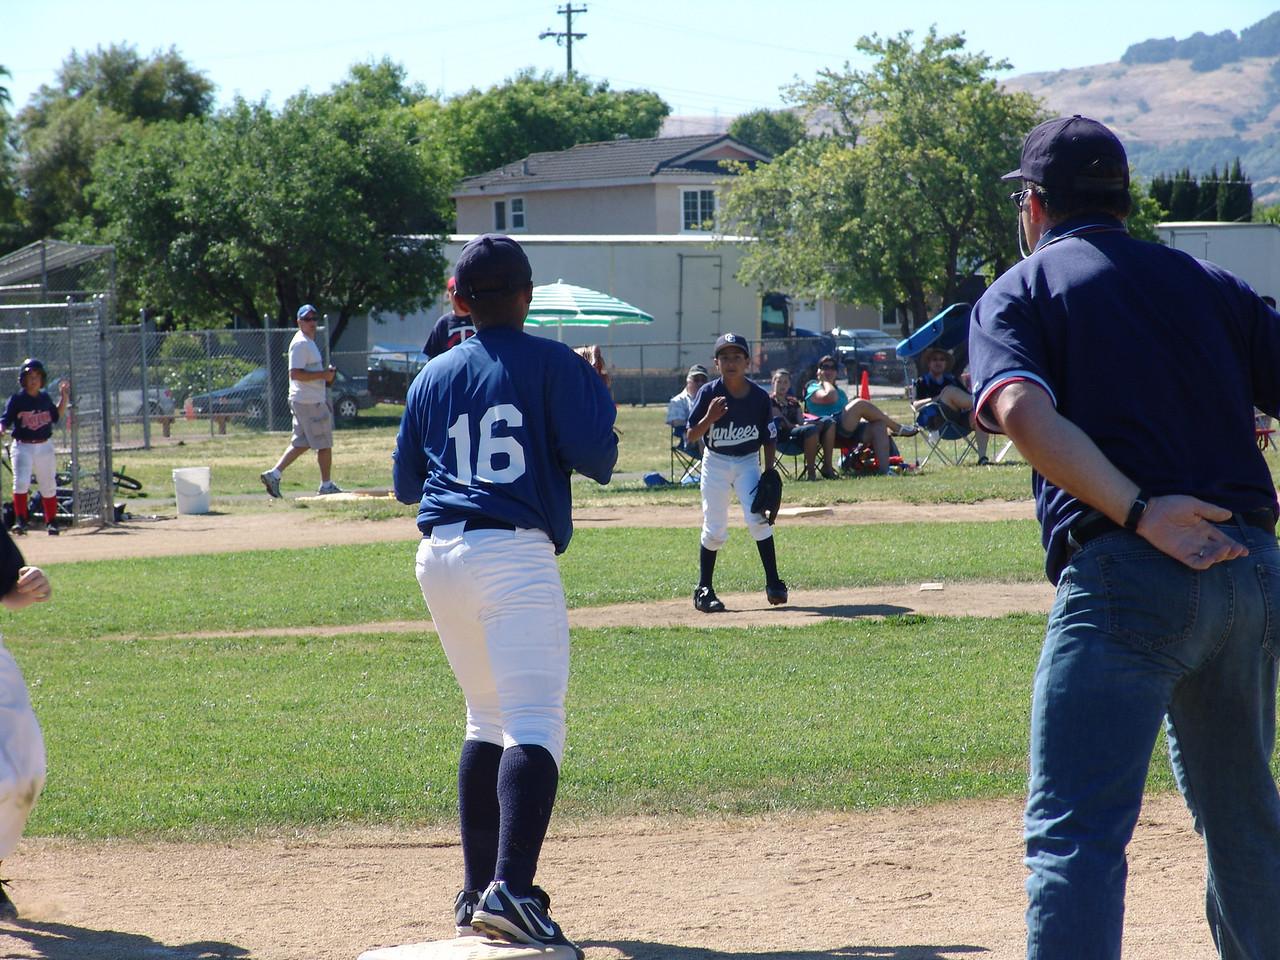 Yankees vs Twins TrnRnd2 (6)